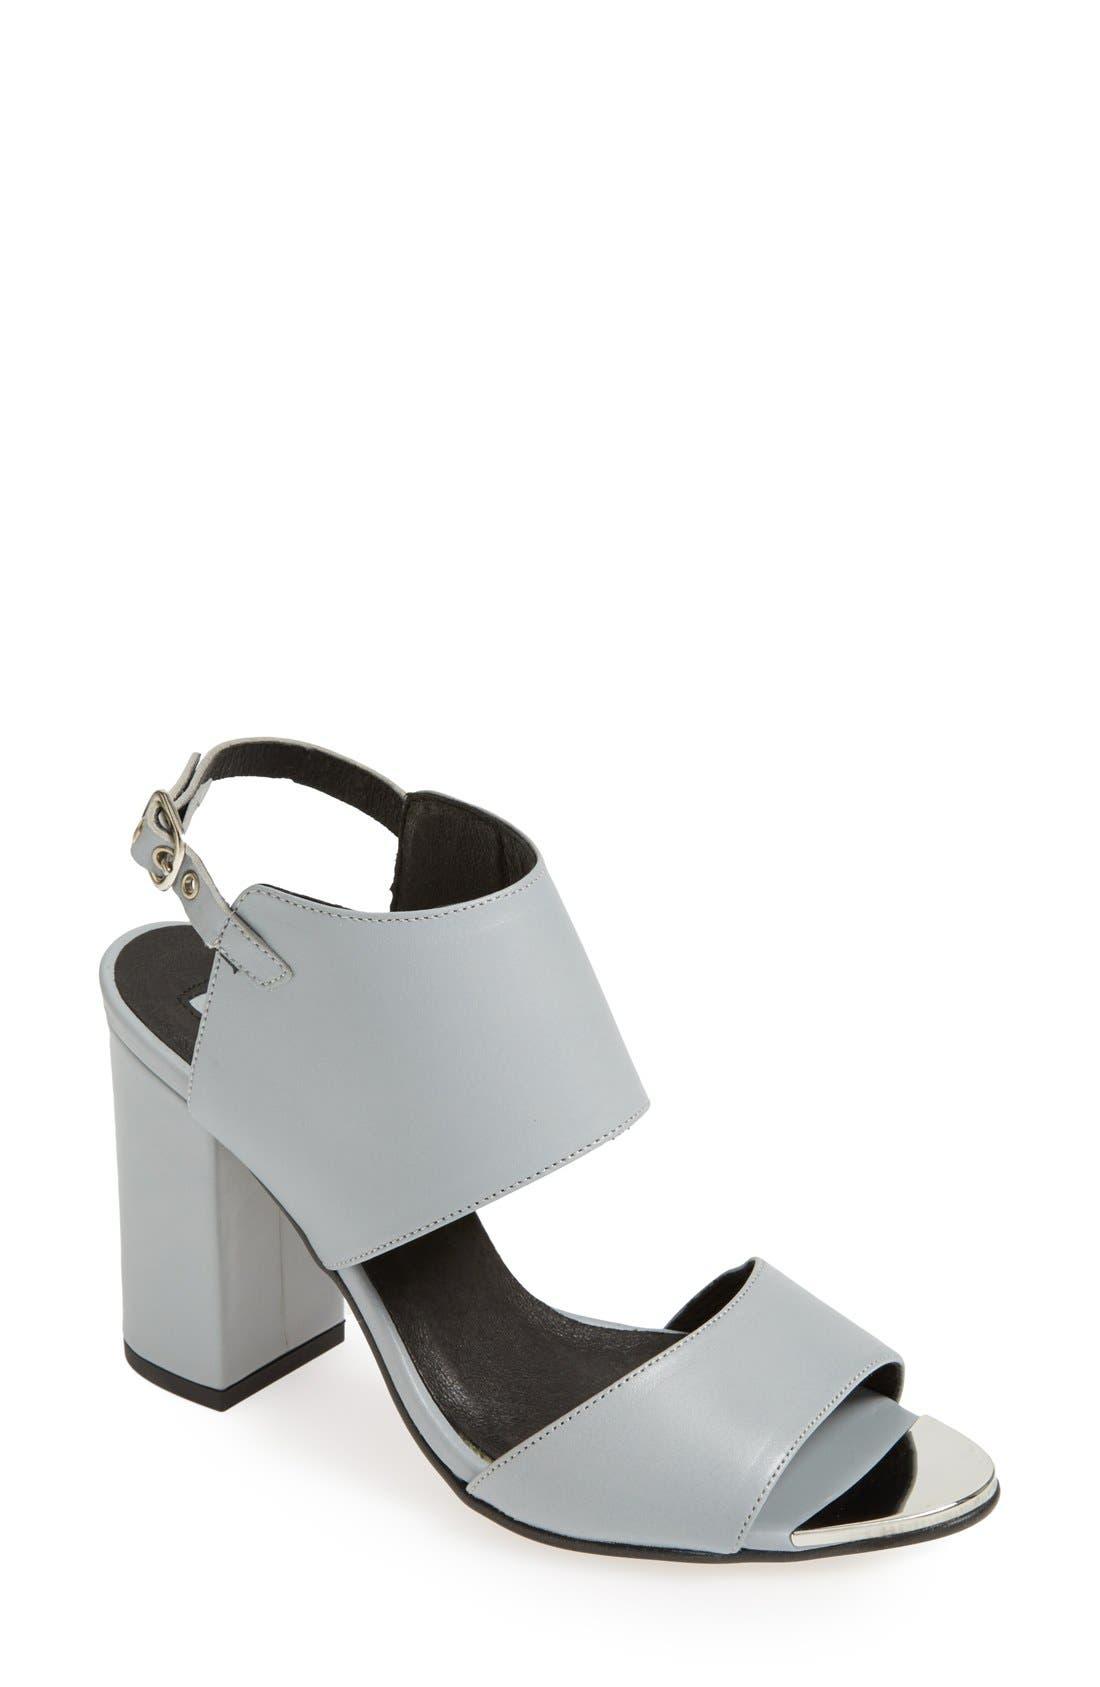 Main Image - Topshop 'Raff' Sandal (Women)